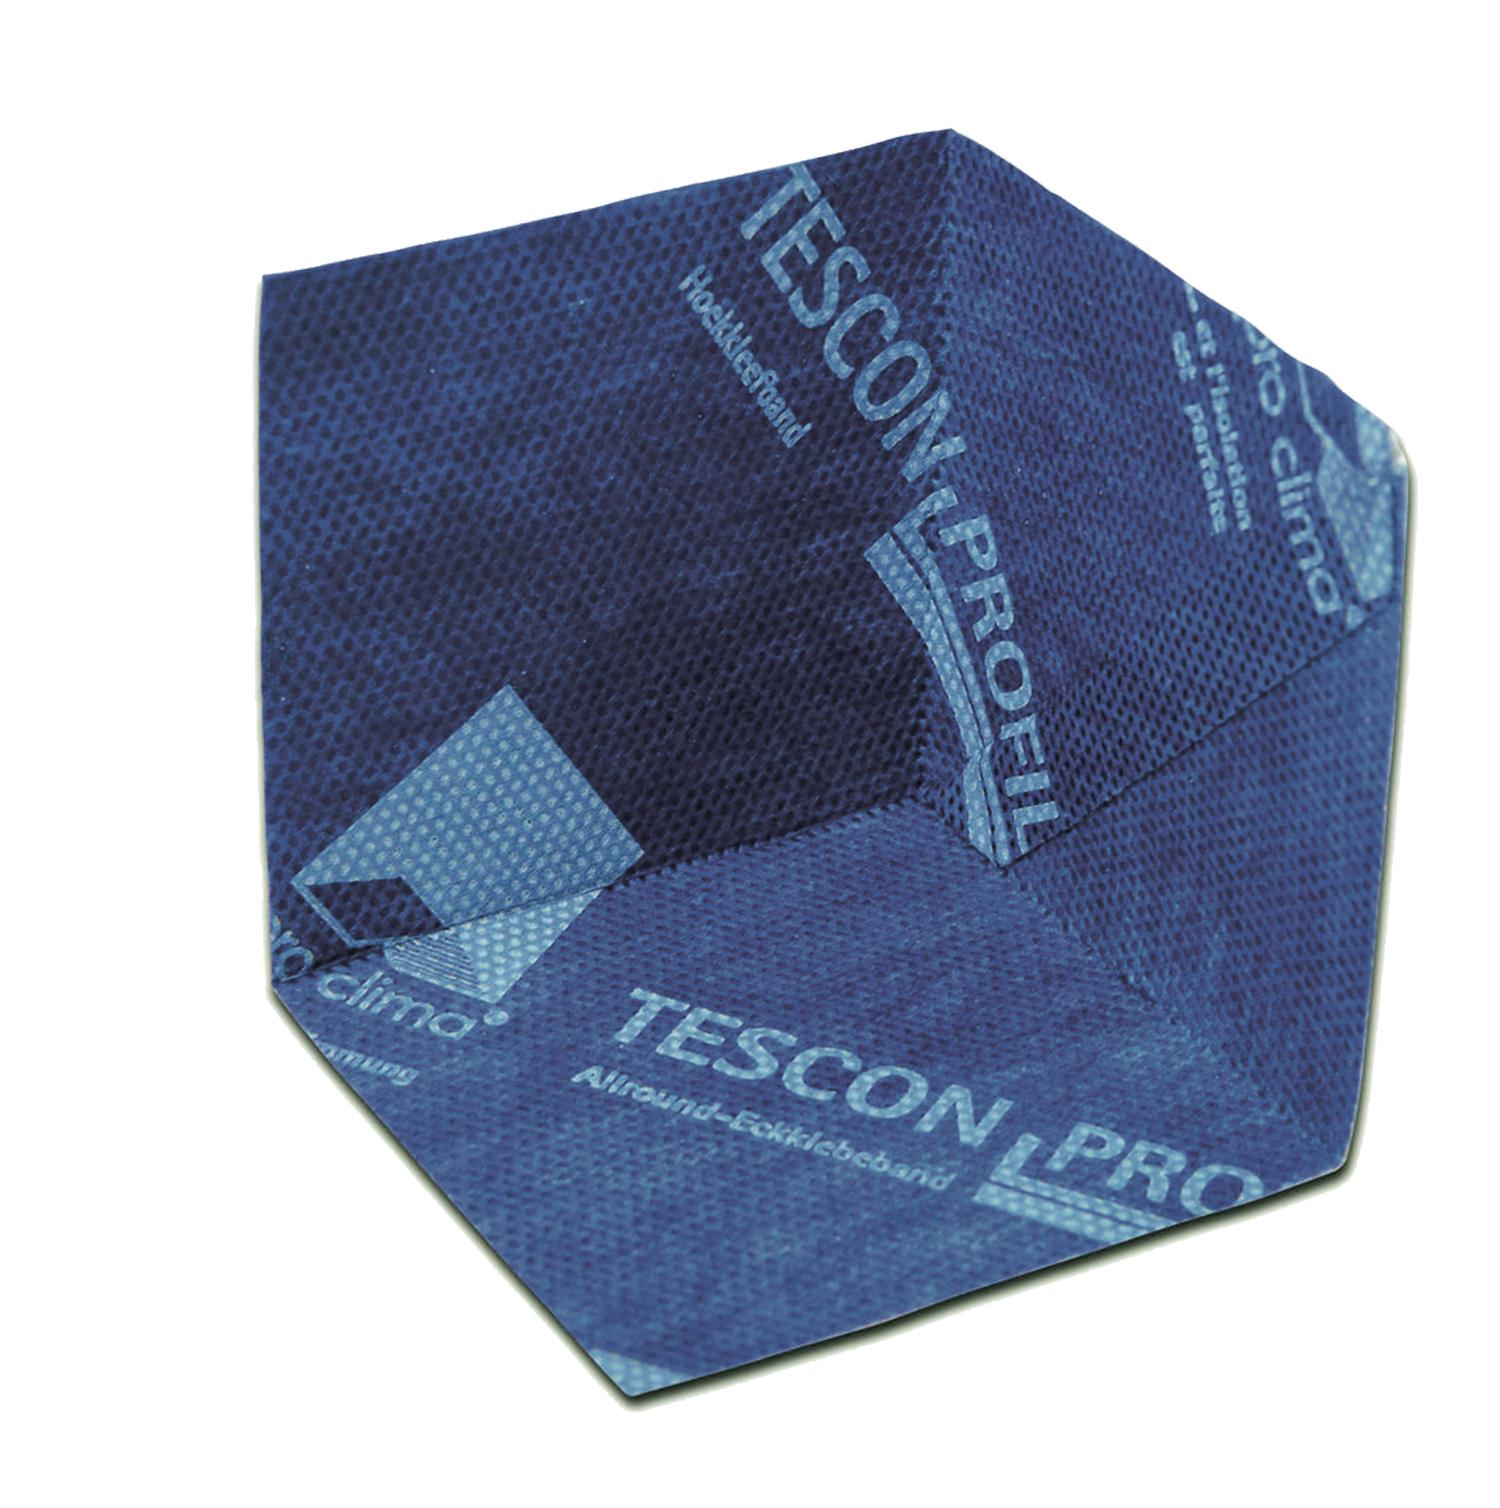 p_TESCON_INCAV Kopie